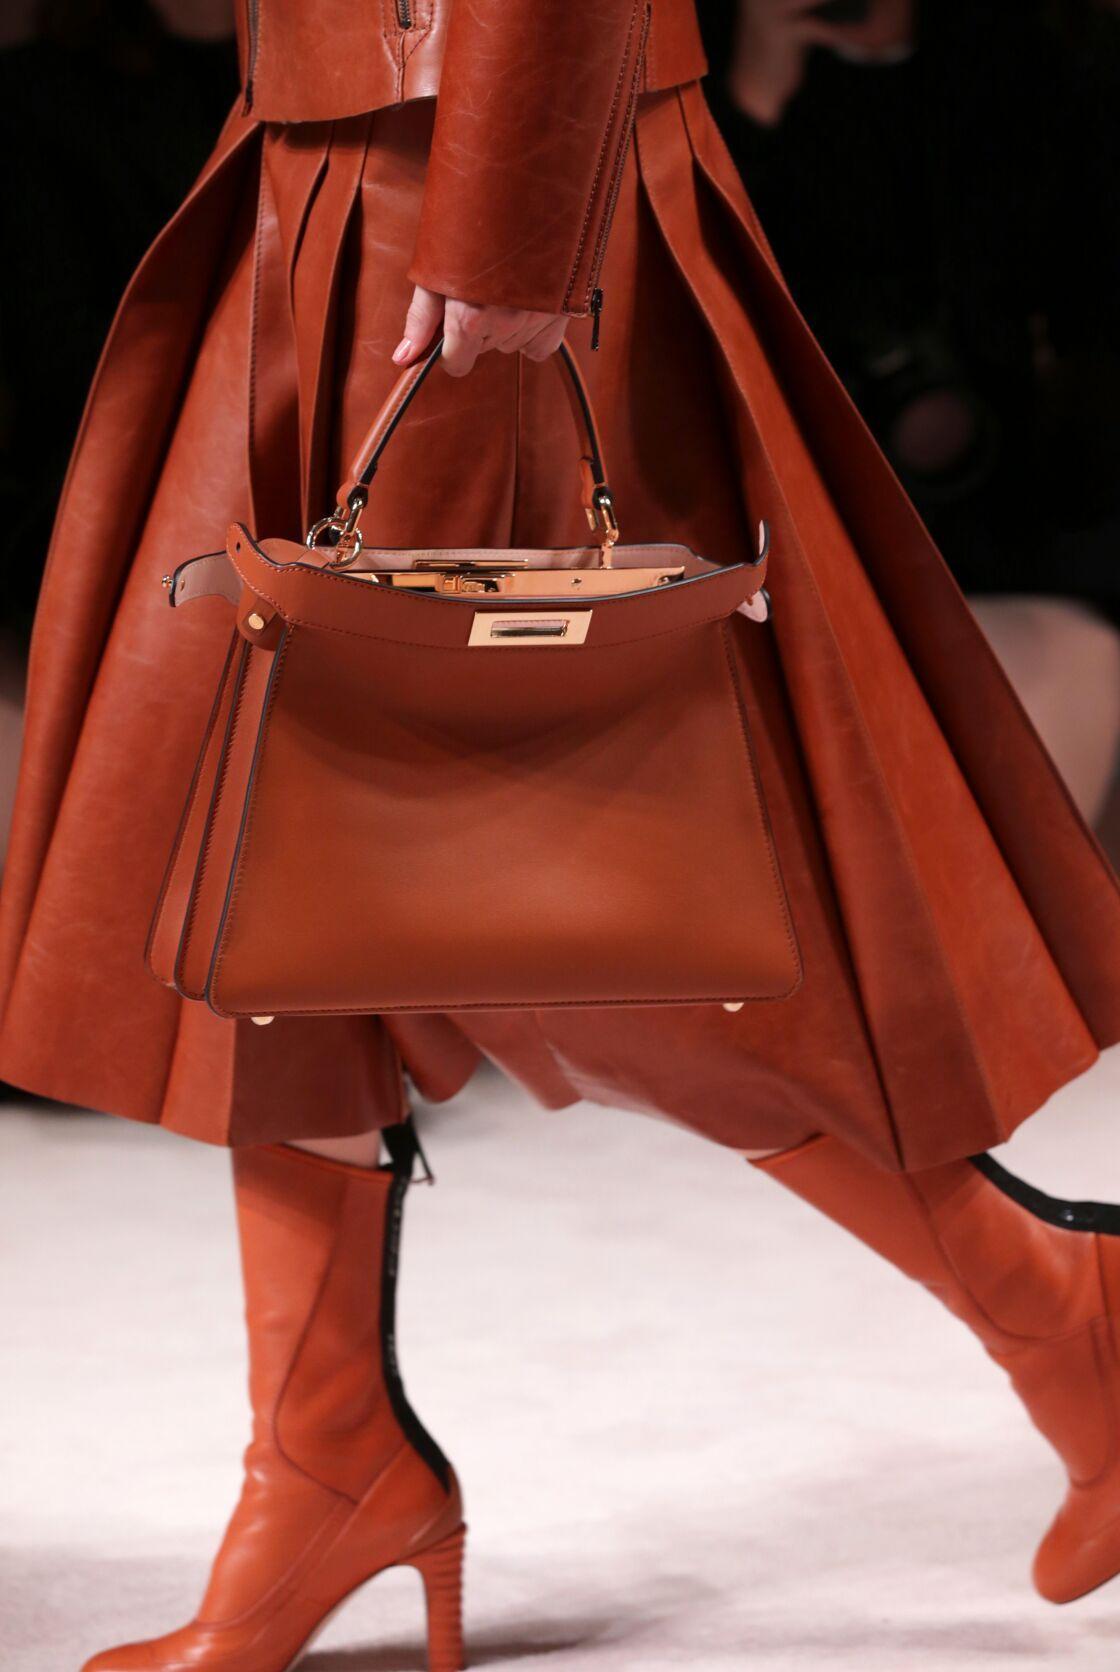 Accessoire phare de la Maison Fendi, le Peekaboo IseeU en cuir, 3400 € défile lors de la Fashion Week de Milan